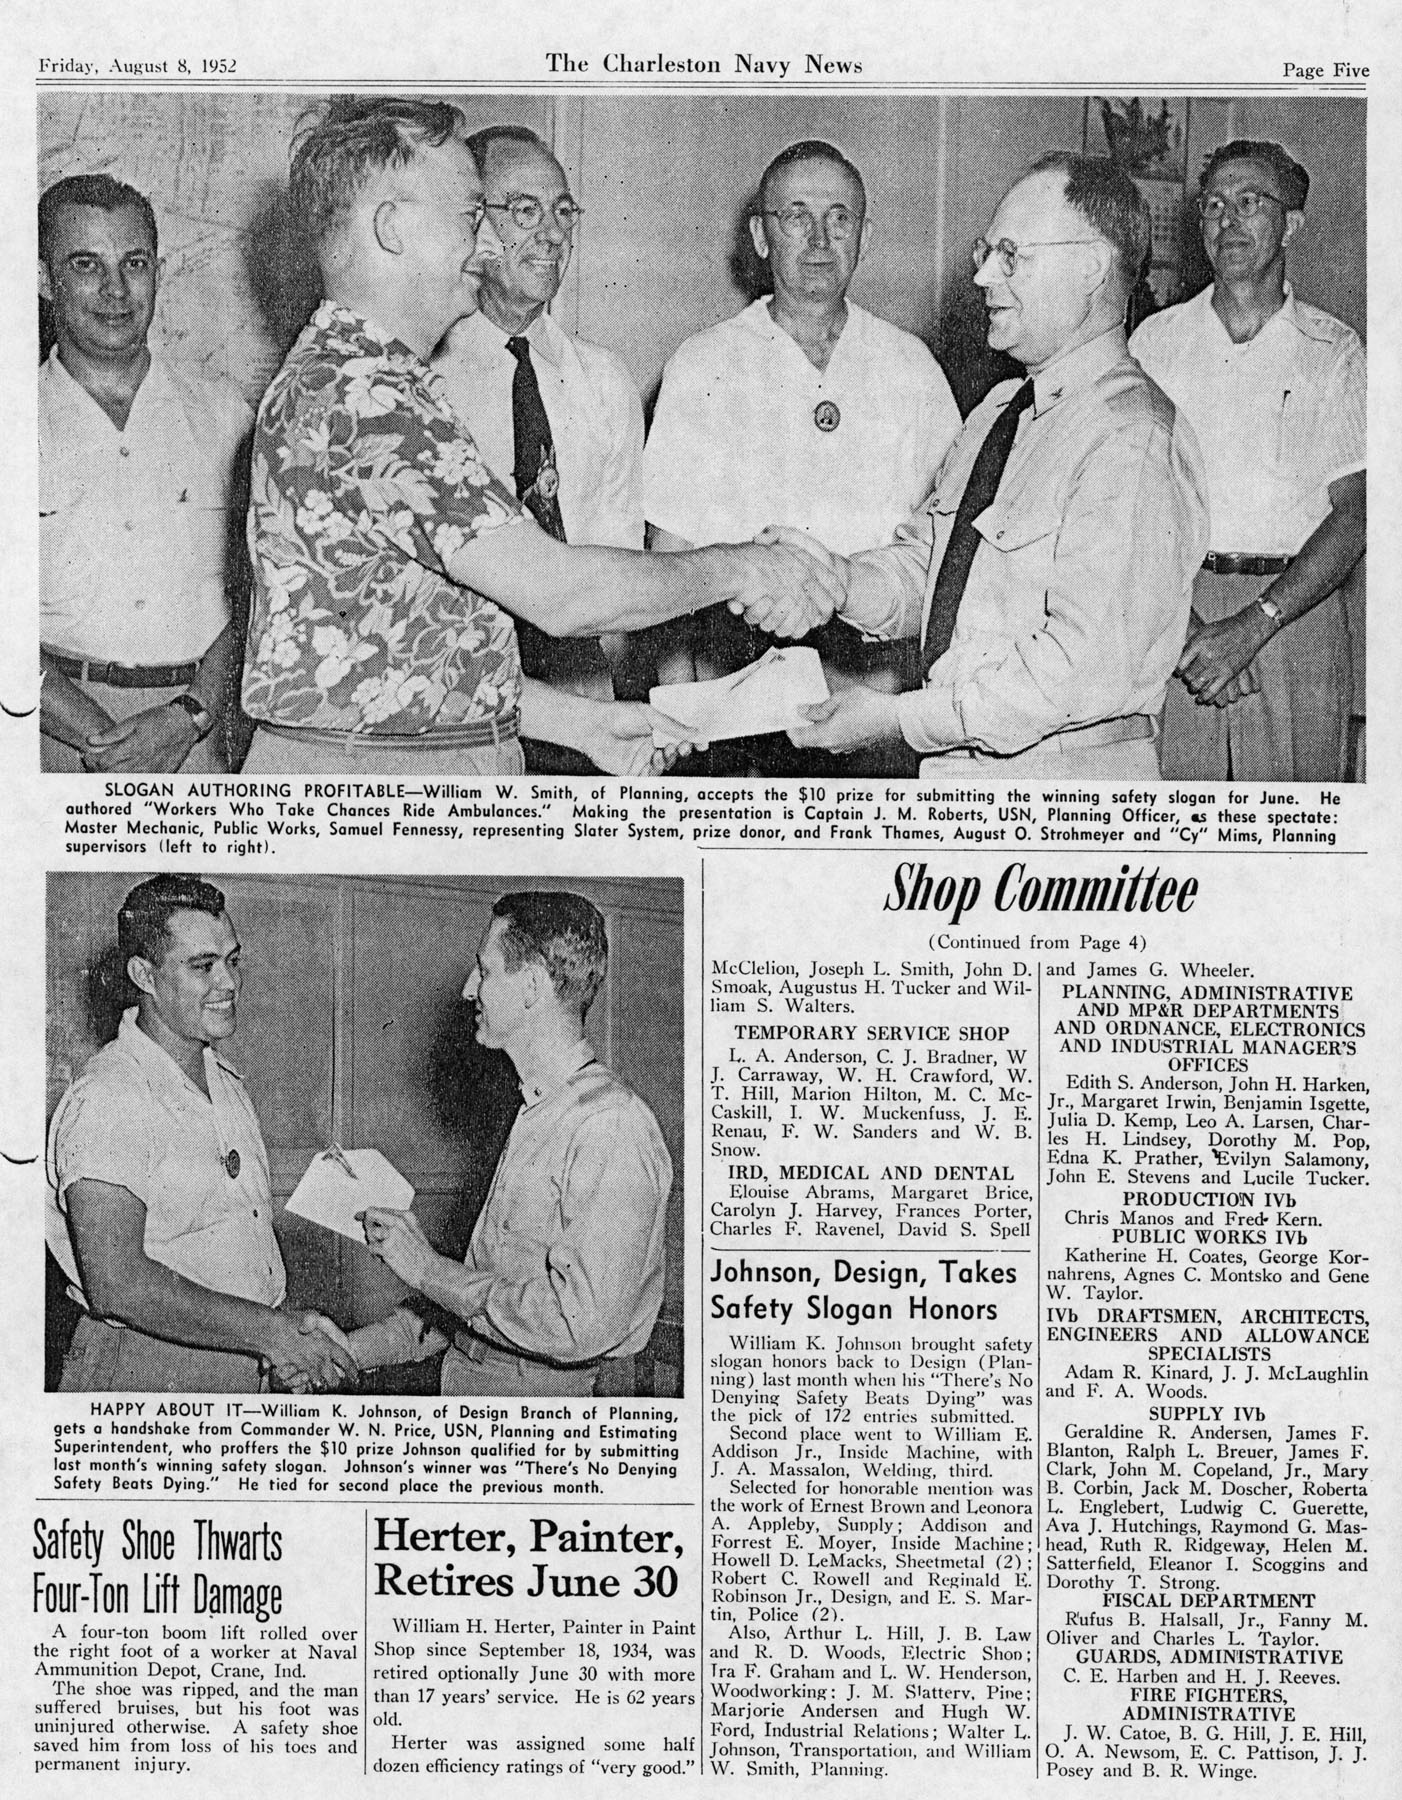 The Charleston Navy News, Volume 11, Edition 1, page v